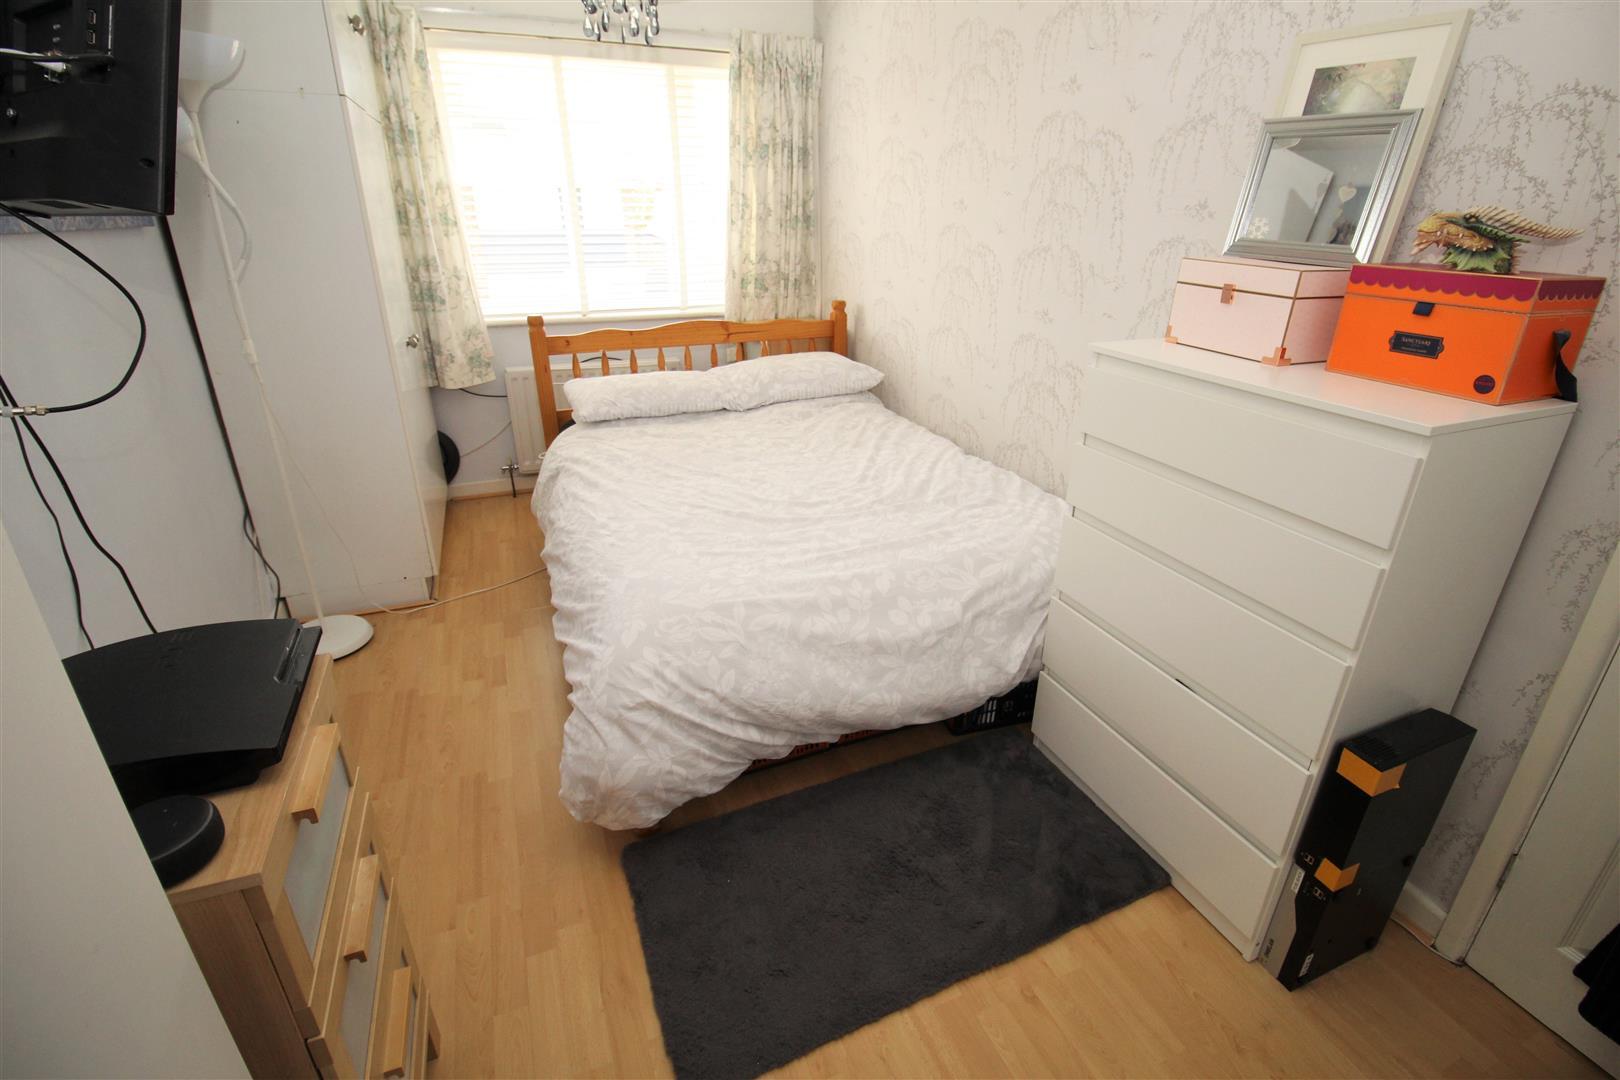 3 Bedrooms, House - Semi-Detached, Elizabeth Road, Fazakerley, Liverpool